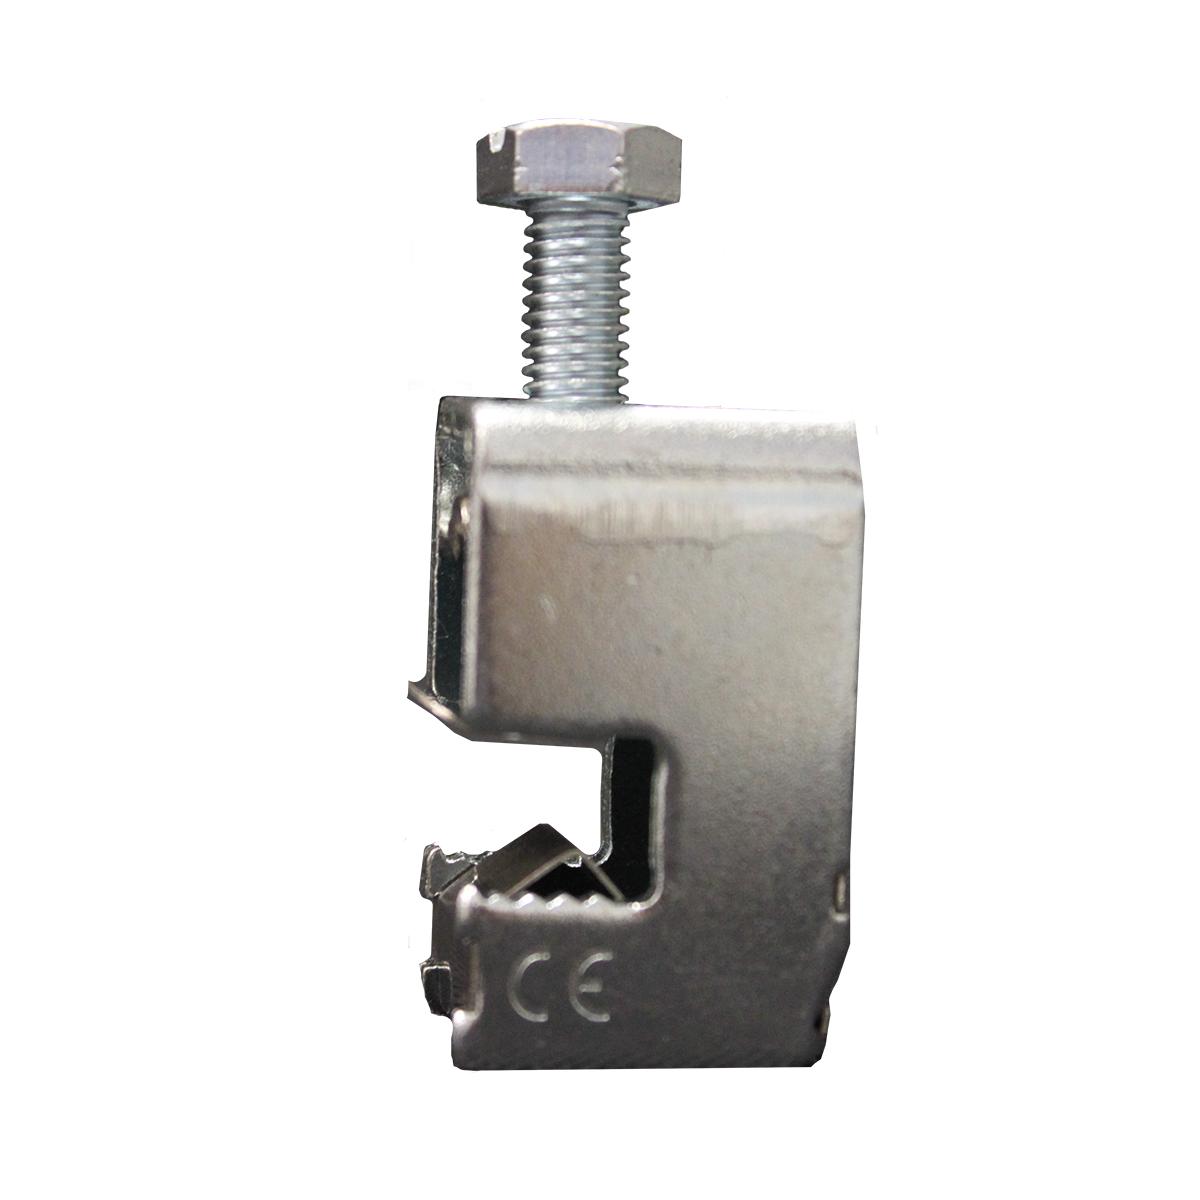 1 Stk Alu-Kupfer-Leiteranschlußklemme 4 -35mm² / 10mm² IS5053510-